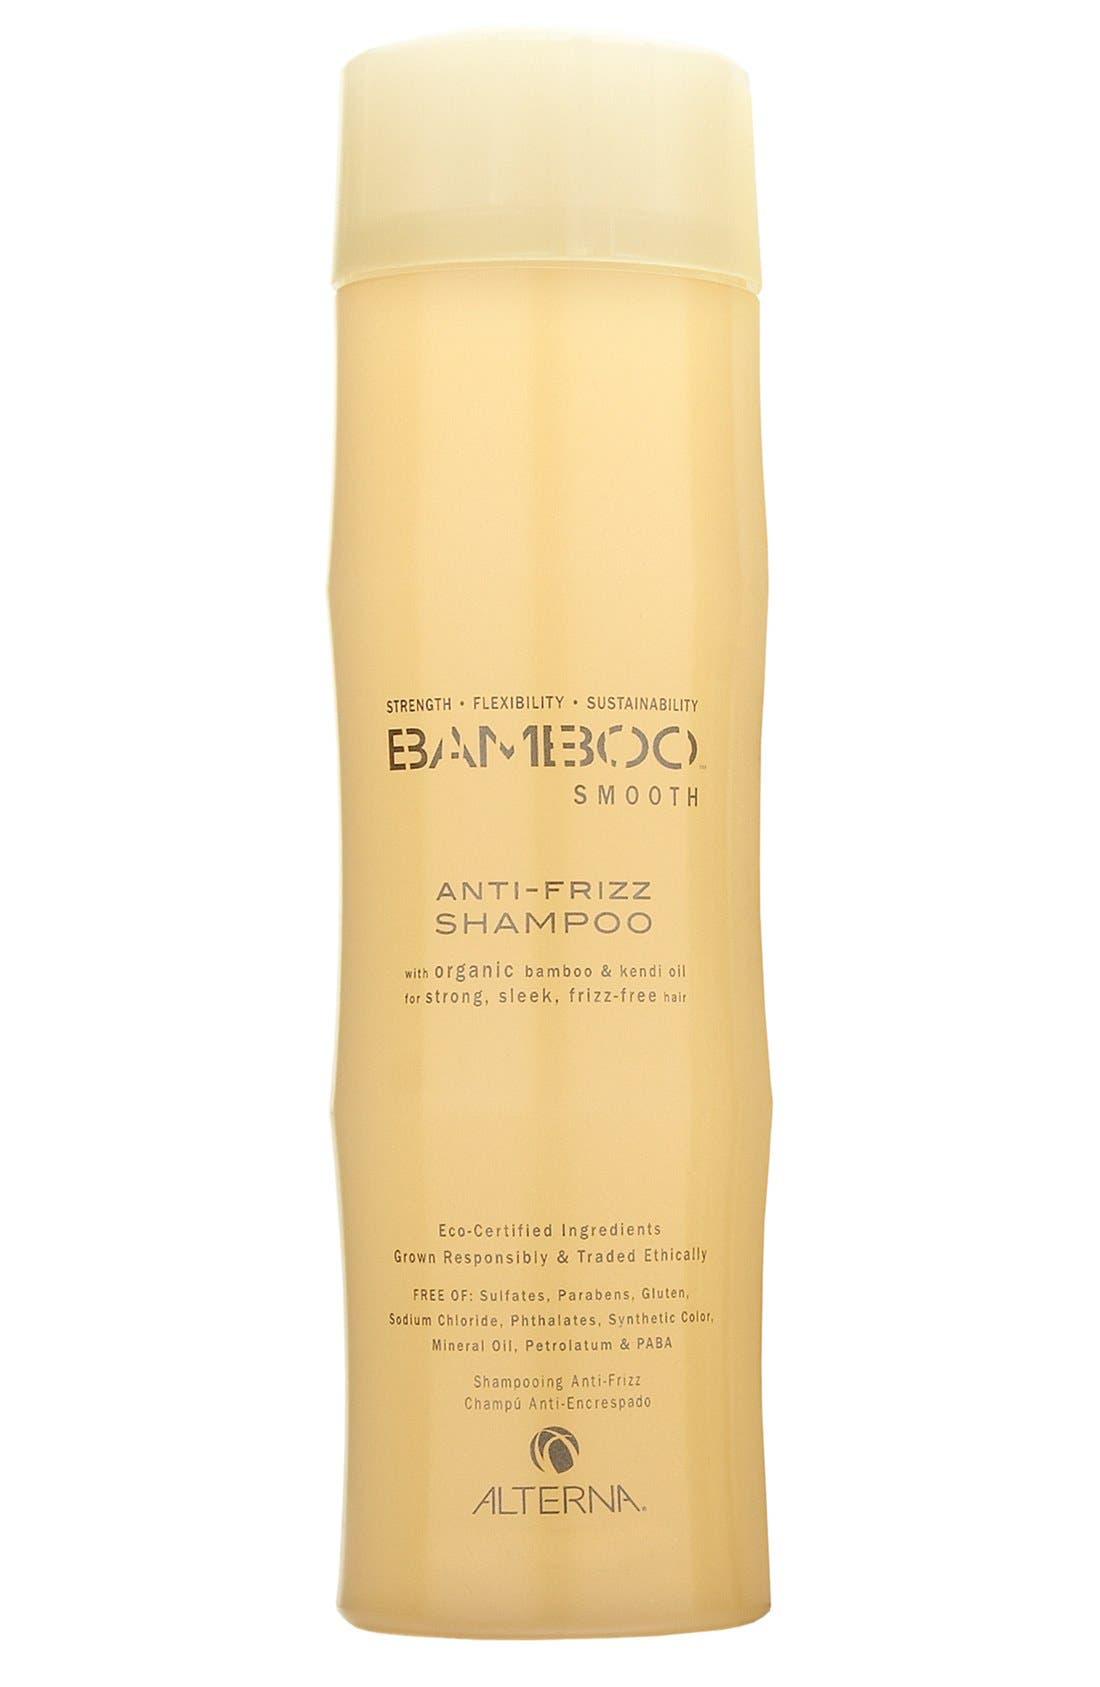 ALTERNA® Bamboo Smooth Anti-Frizz Shampoo